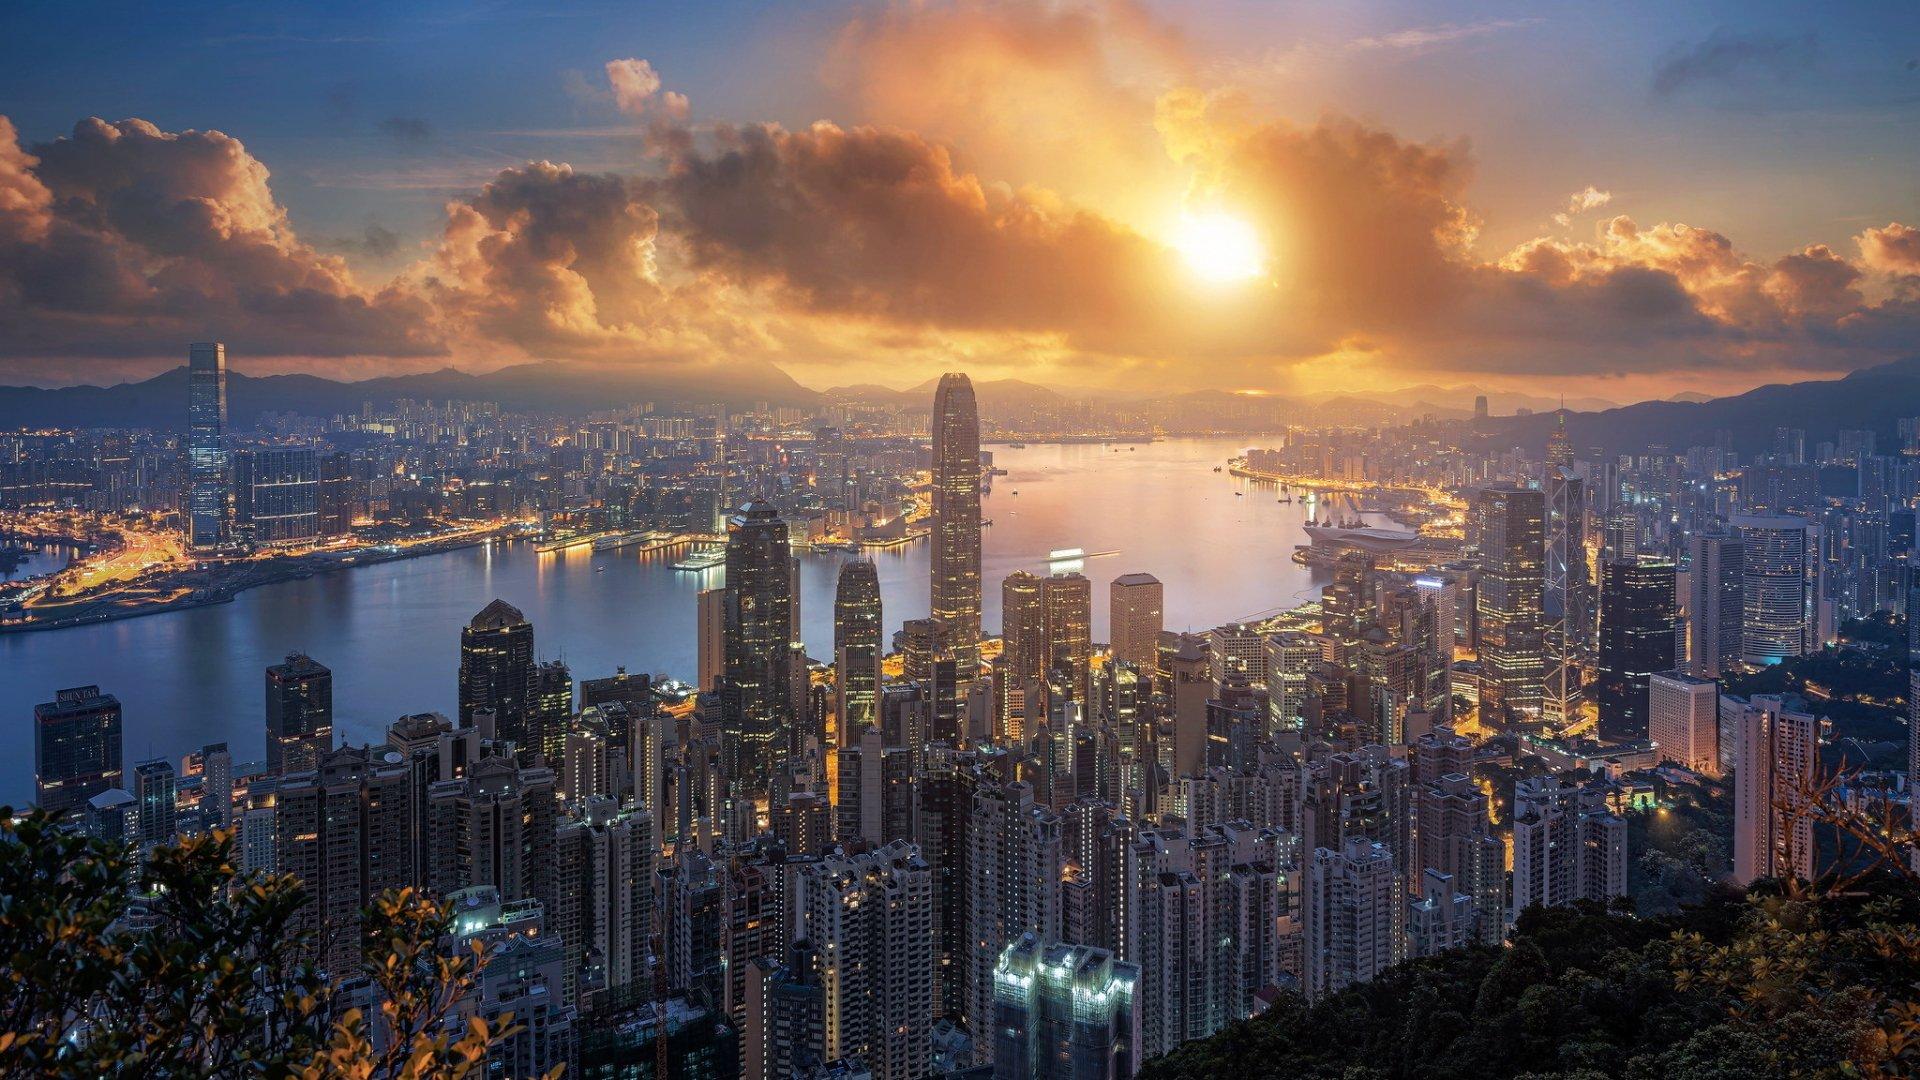 Hong Kong HD Wallpaper